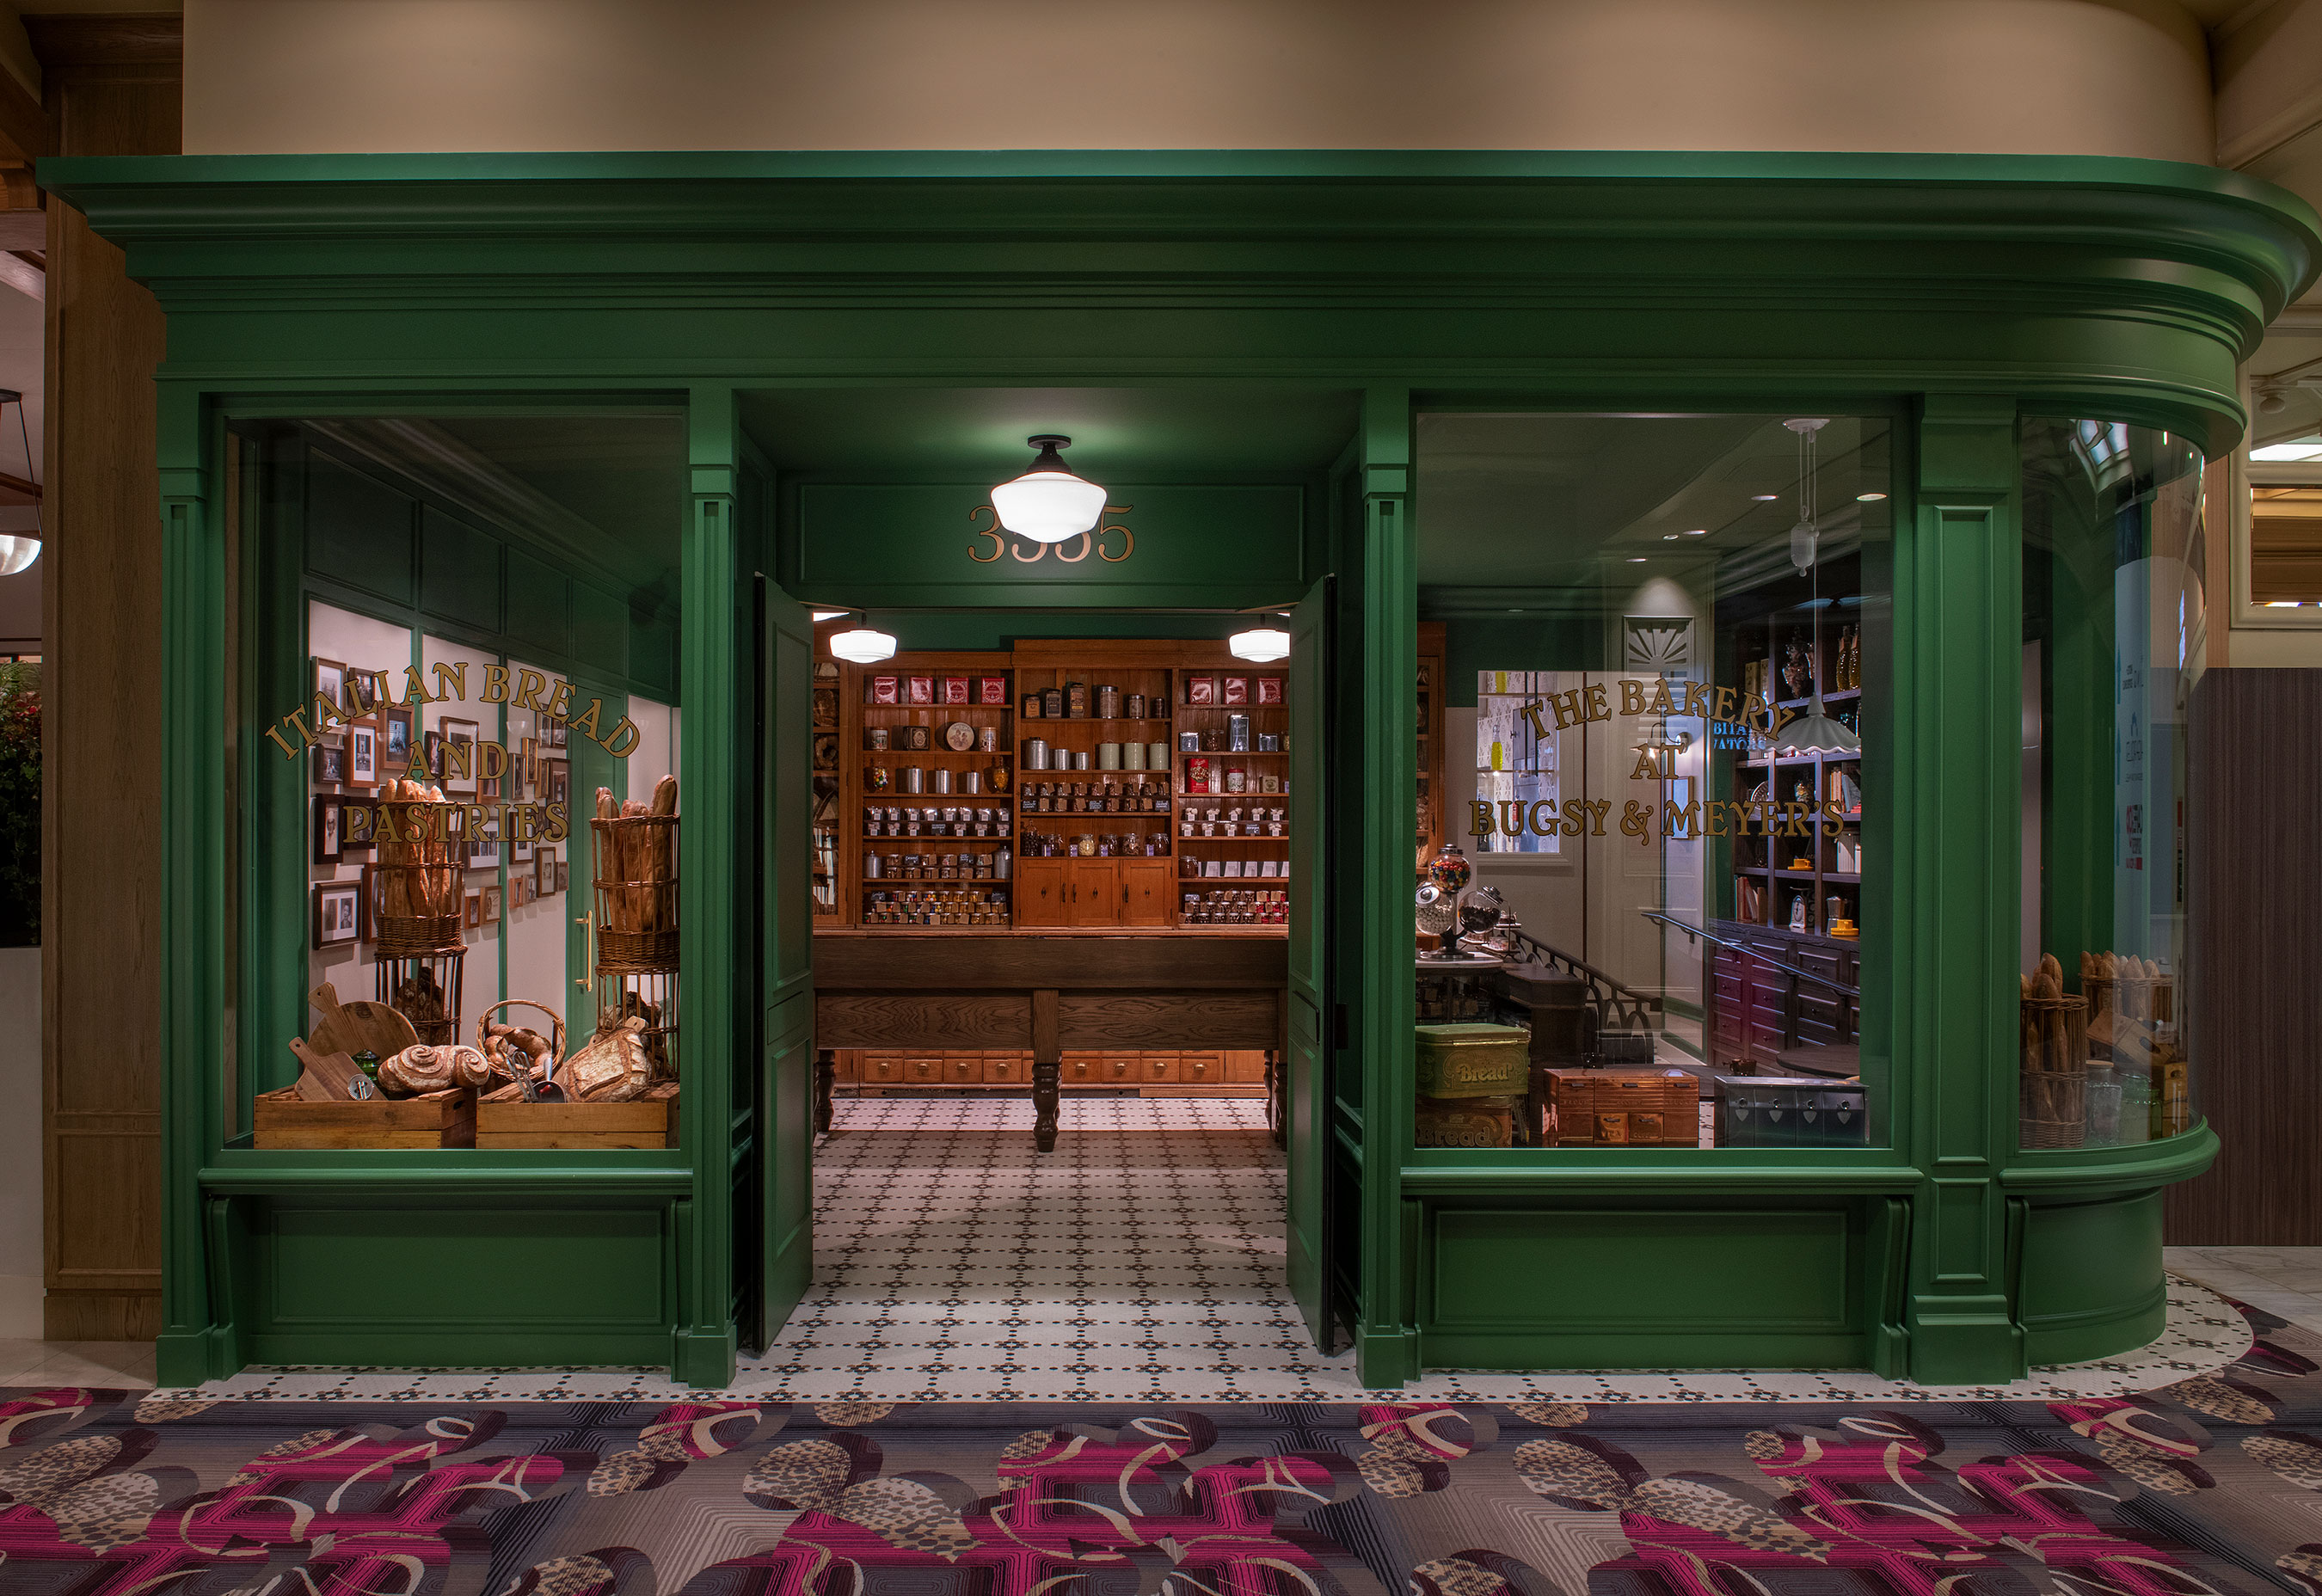 Bakery Entrance of Bugsy & Meyer's Steakhouse at Flamingo Las Vegas